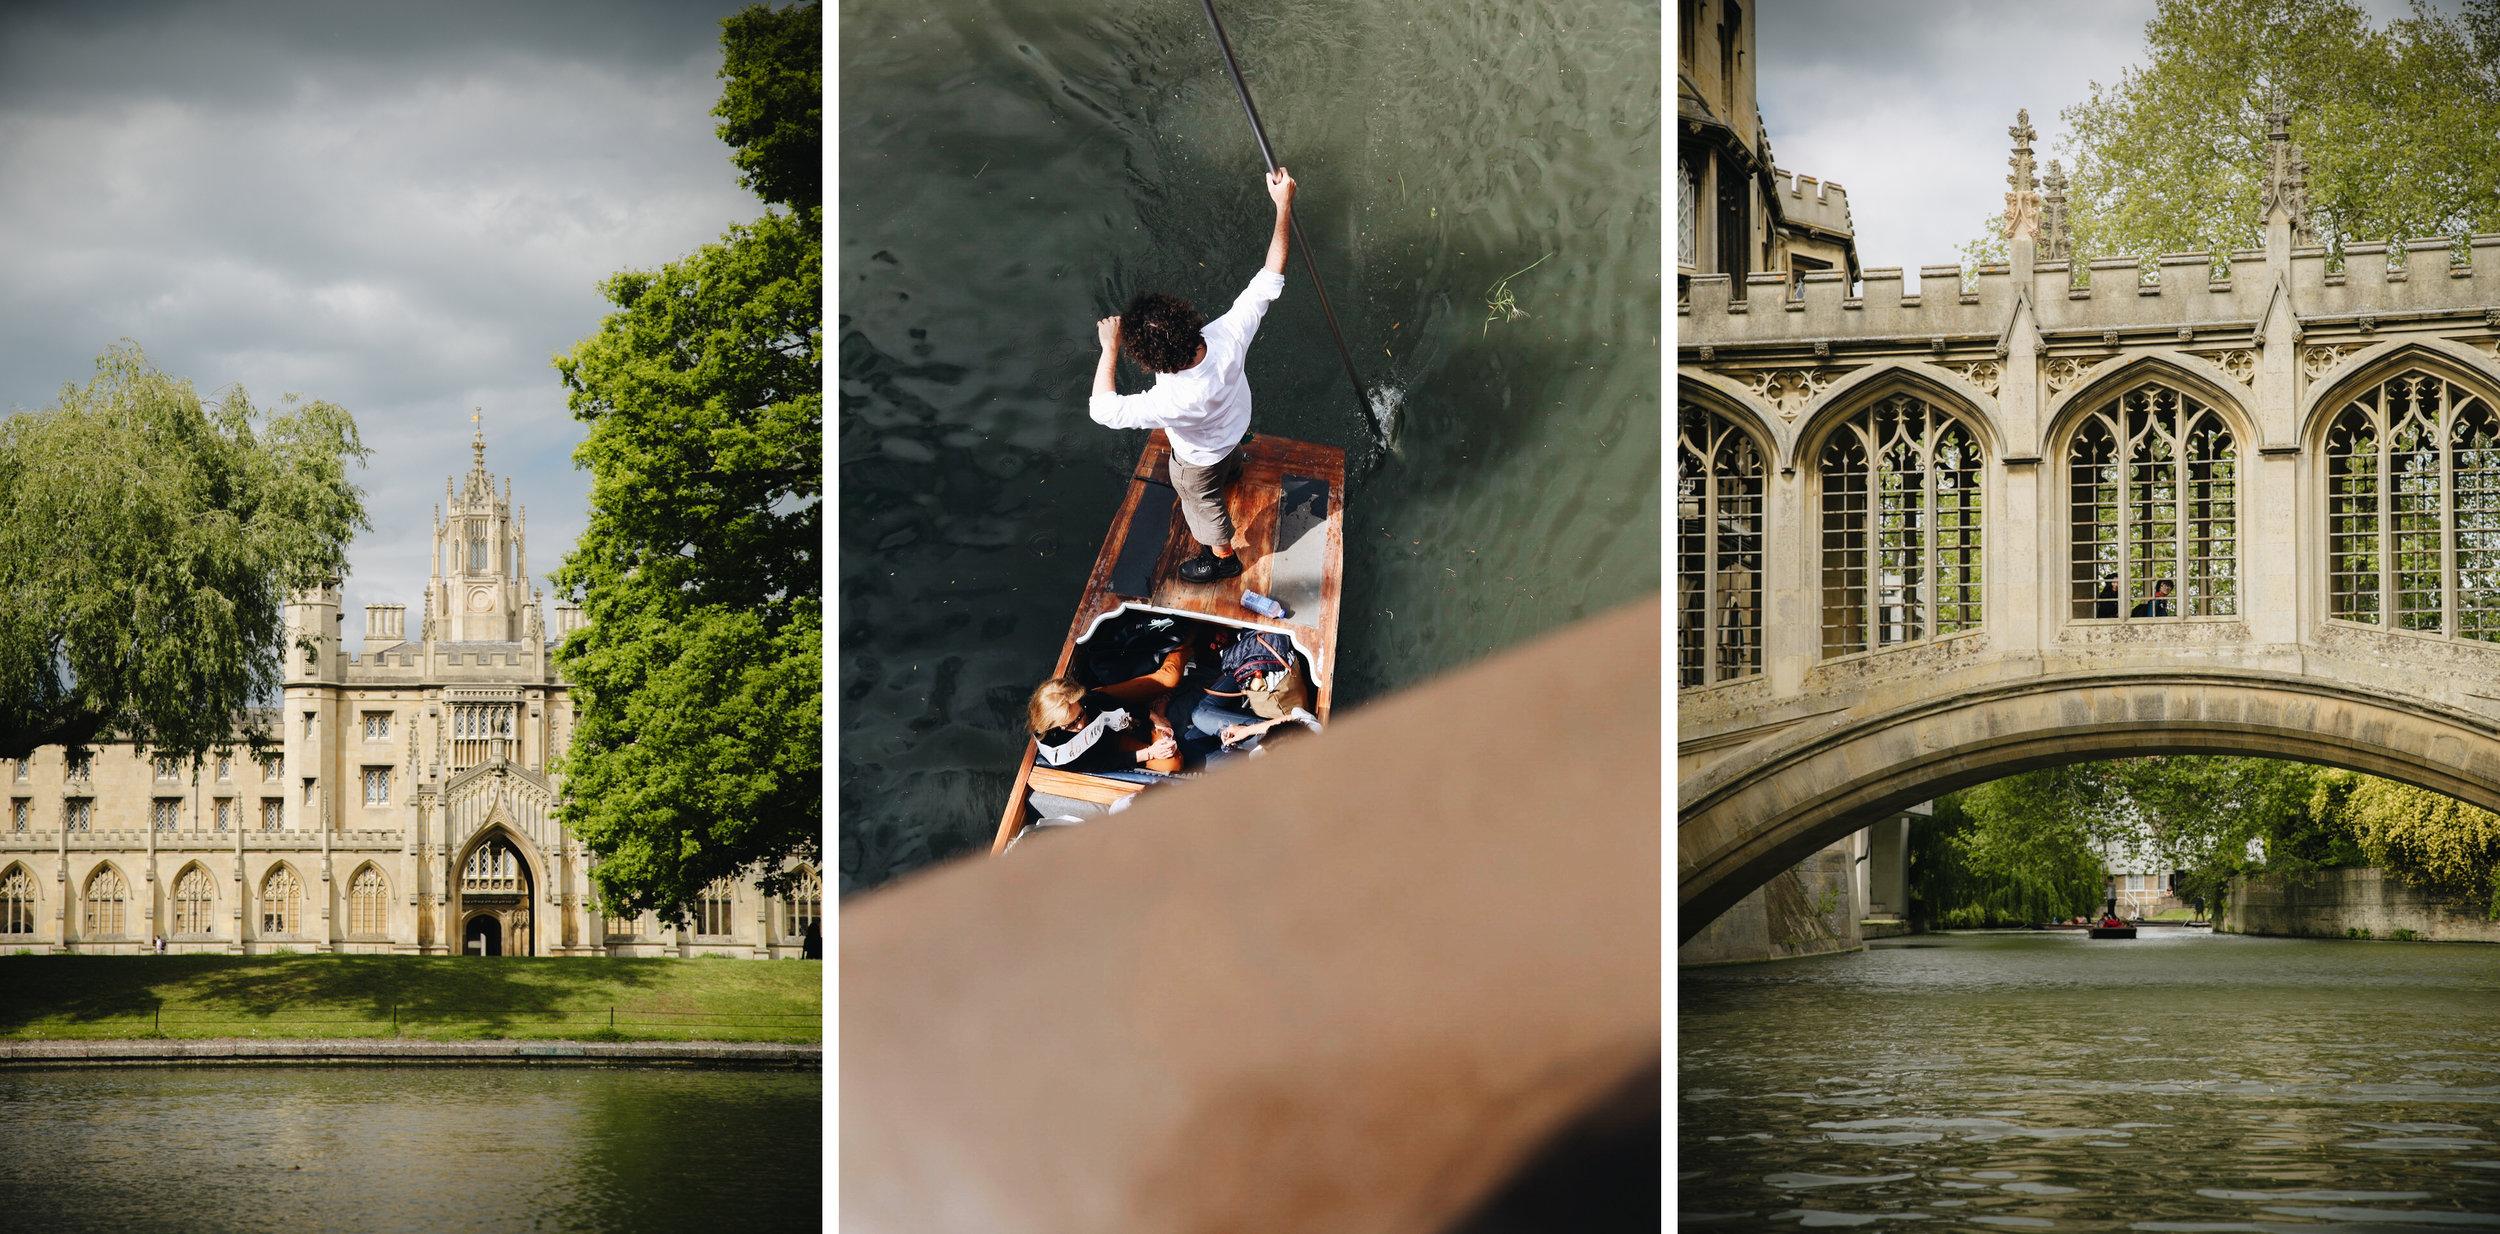 Cambridge-pont-des-soupirs-voyage-blog.jpg